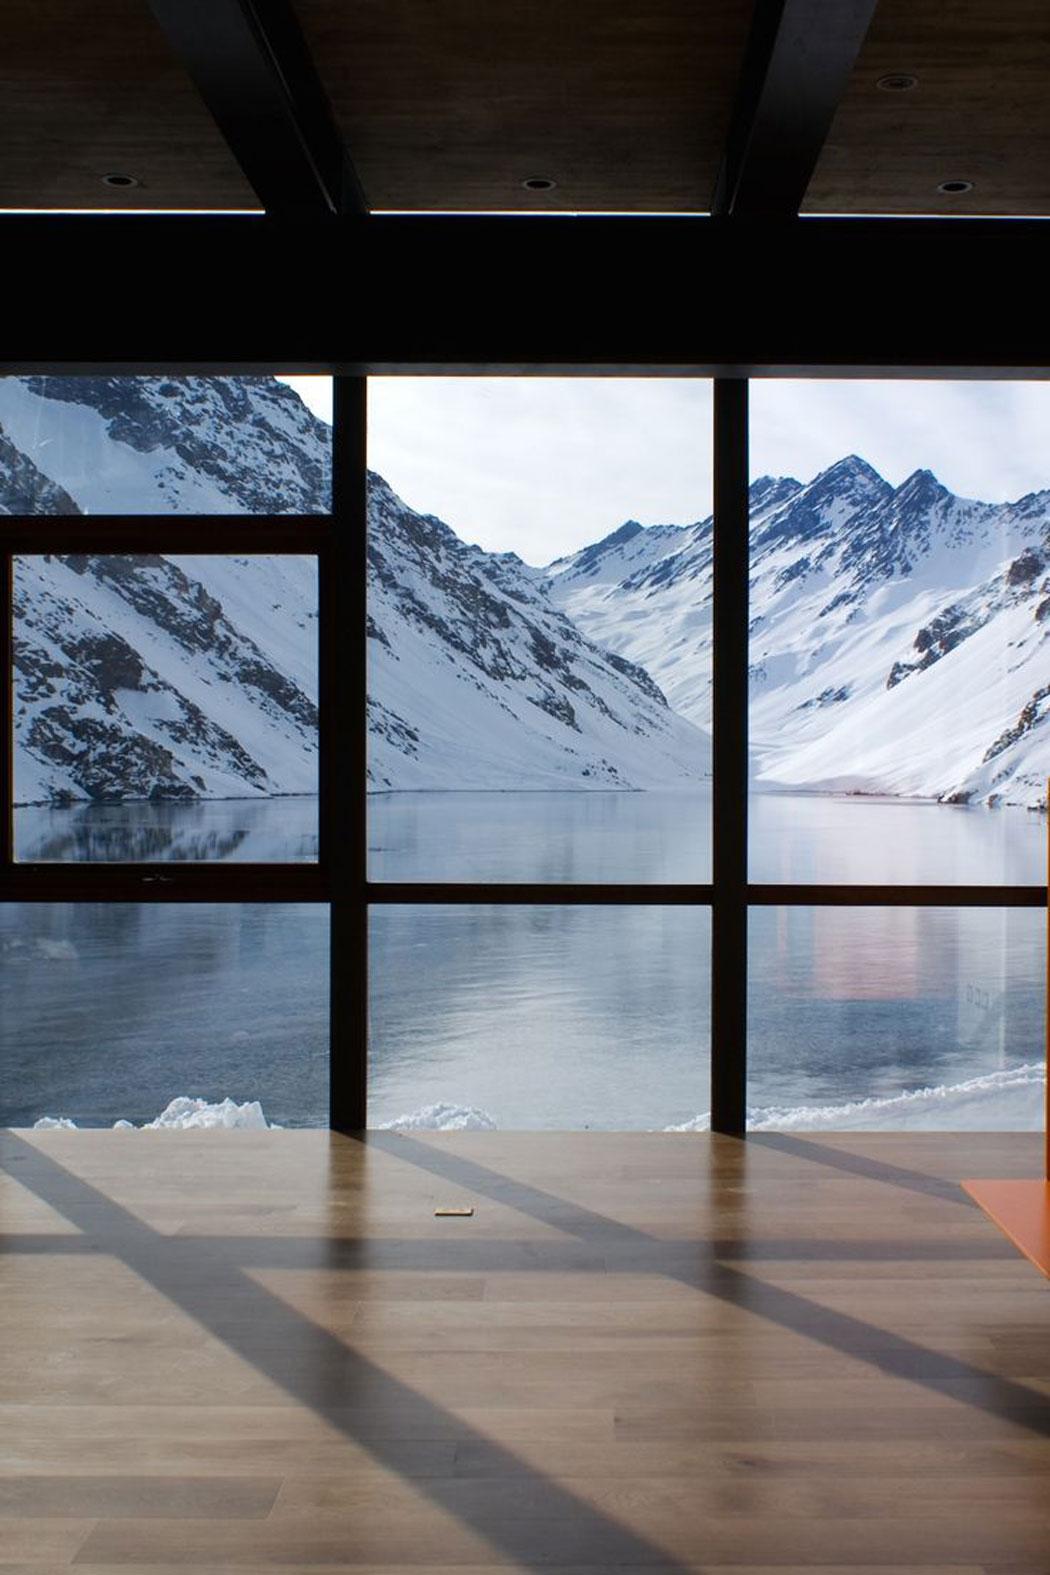 HERO-Dream-House-Mountain-View-ITCHBAN.com.